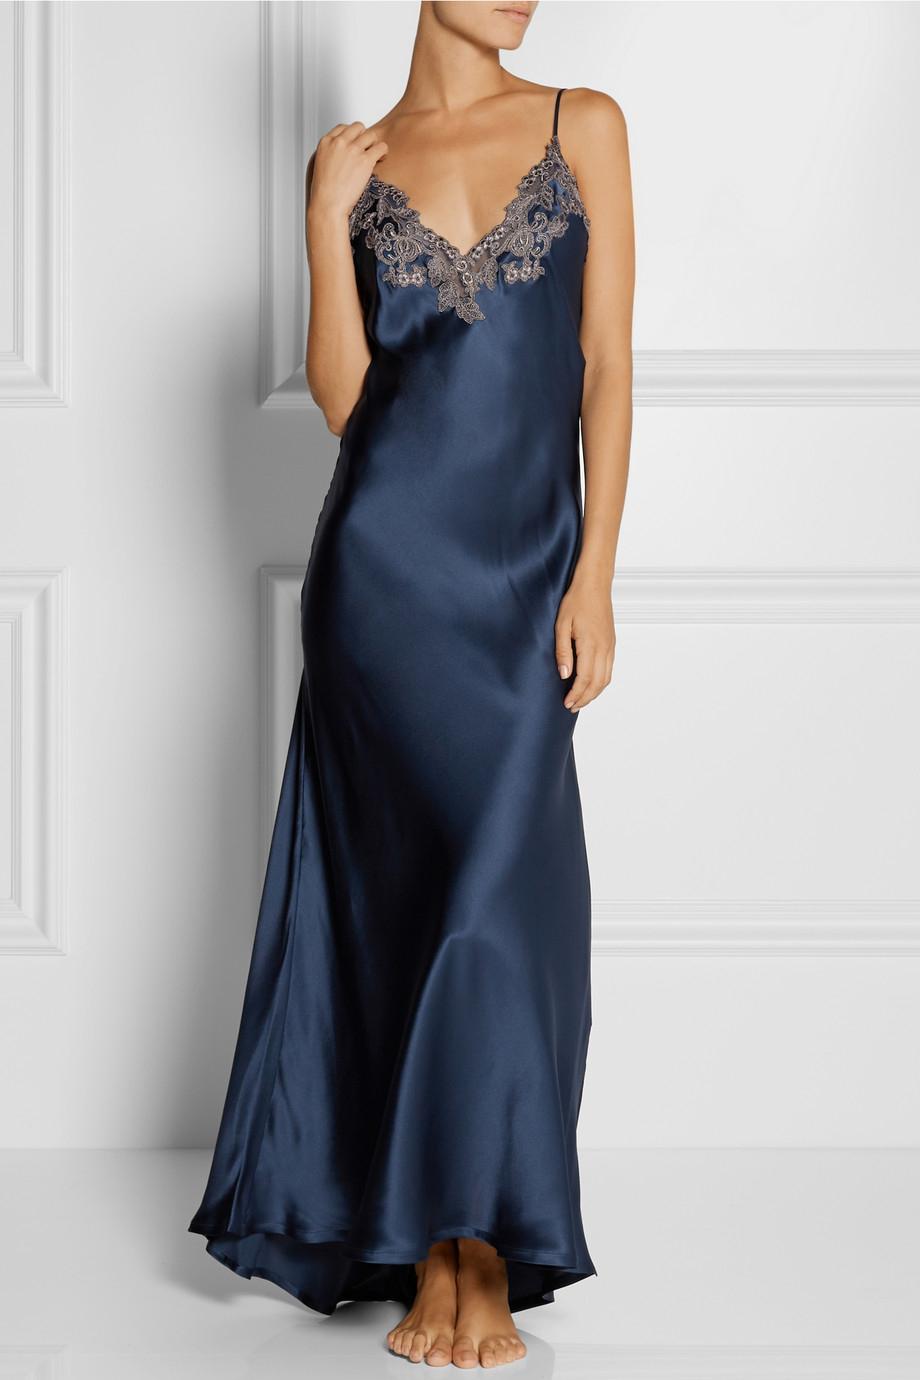 La Perla Maison Lace-Trimmed Silk-Blend Satin Nightdress